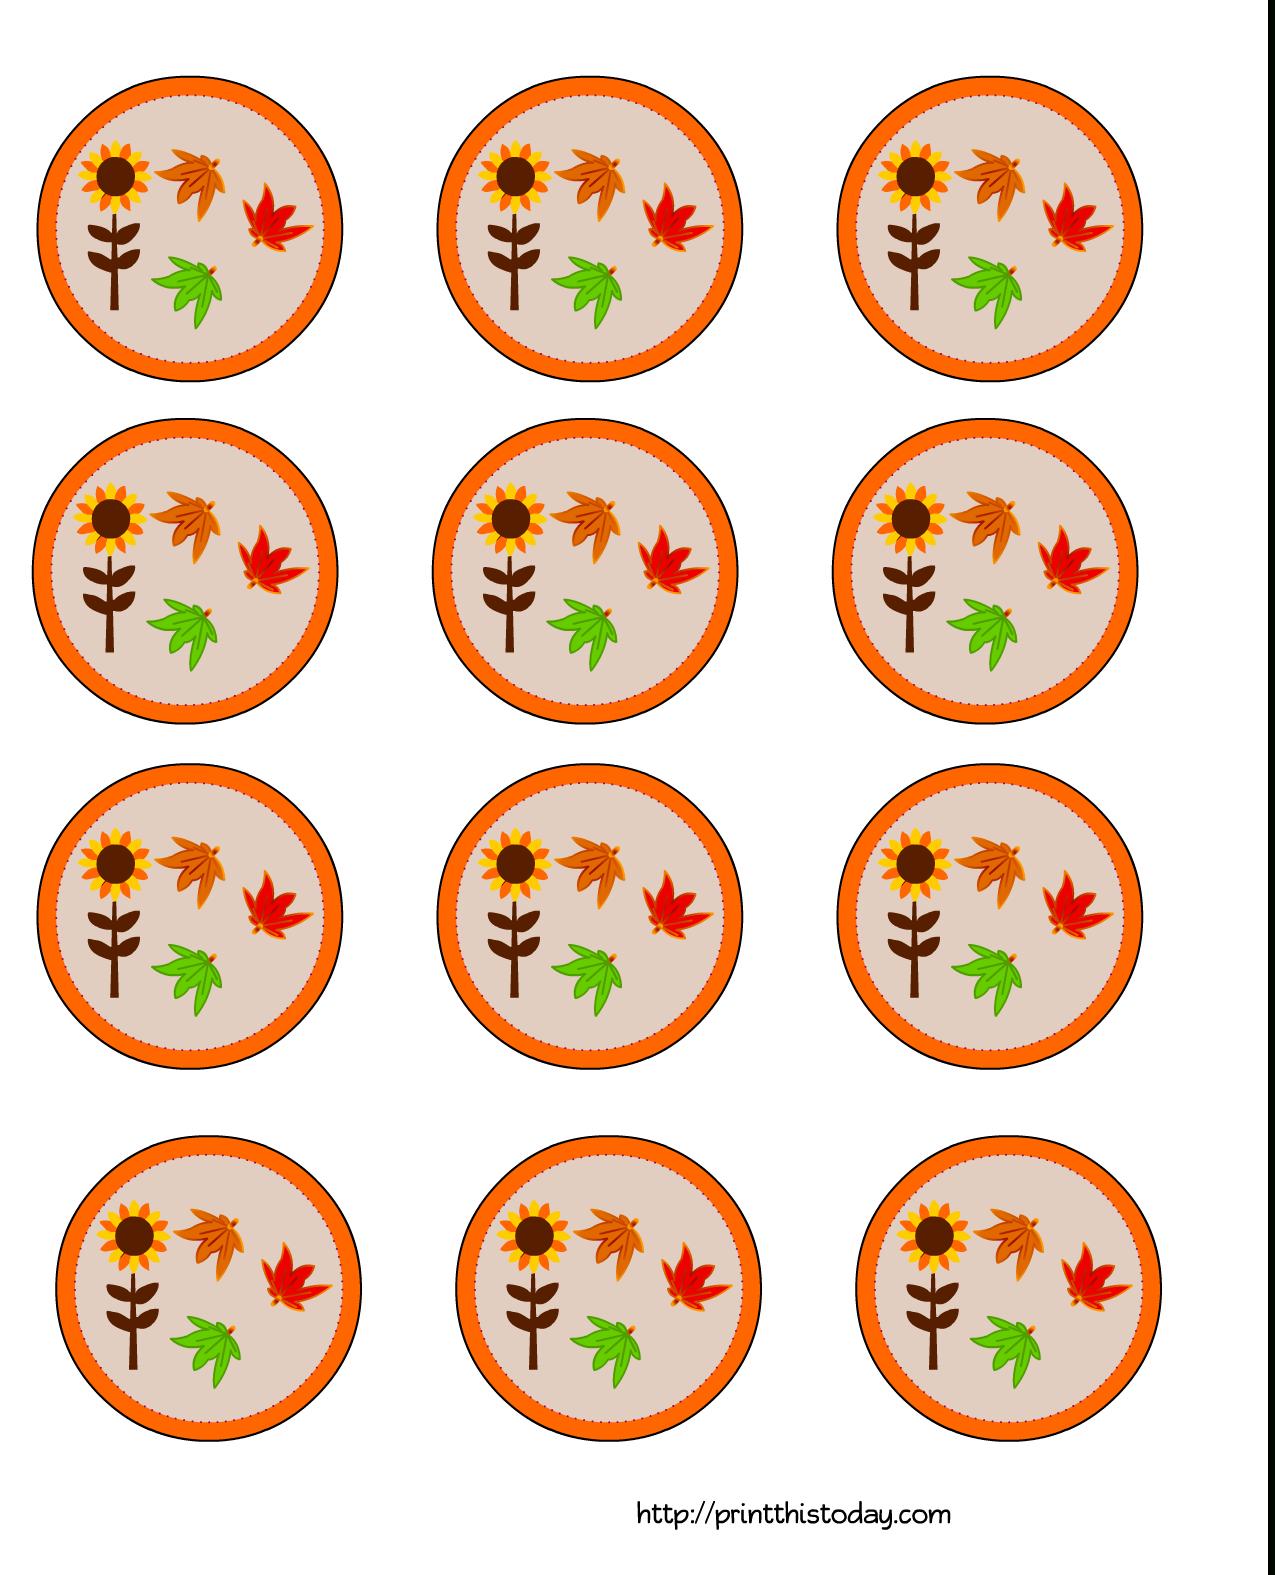 Free Printable Thanksgiving Cupcake Toppers - Thanksgiving Cupcake Toppers Printable Free